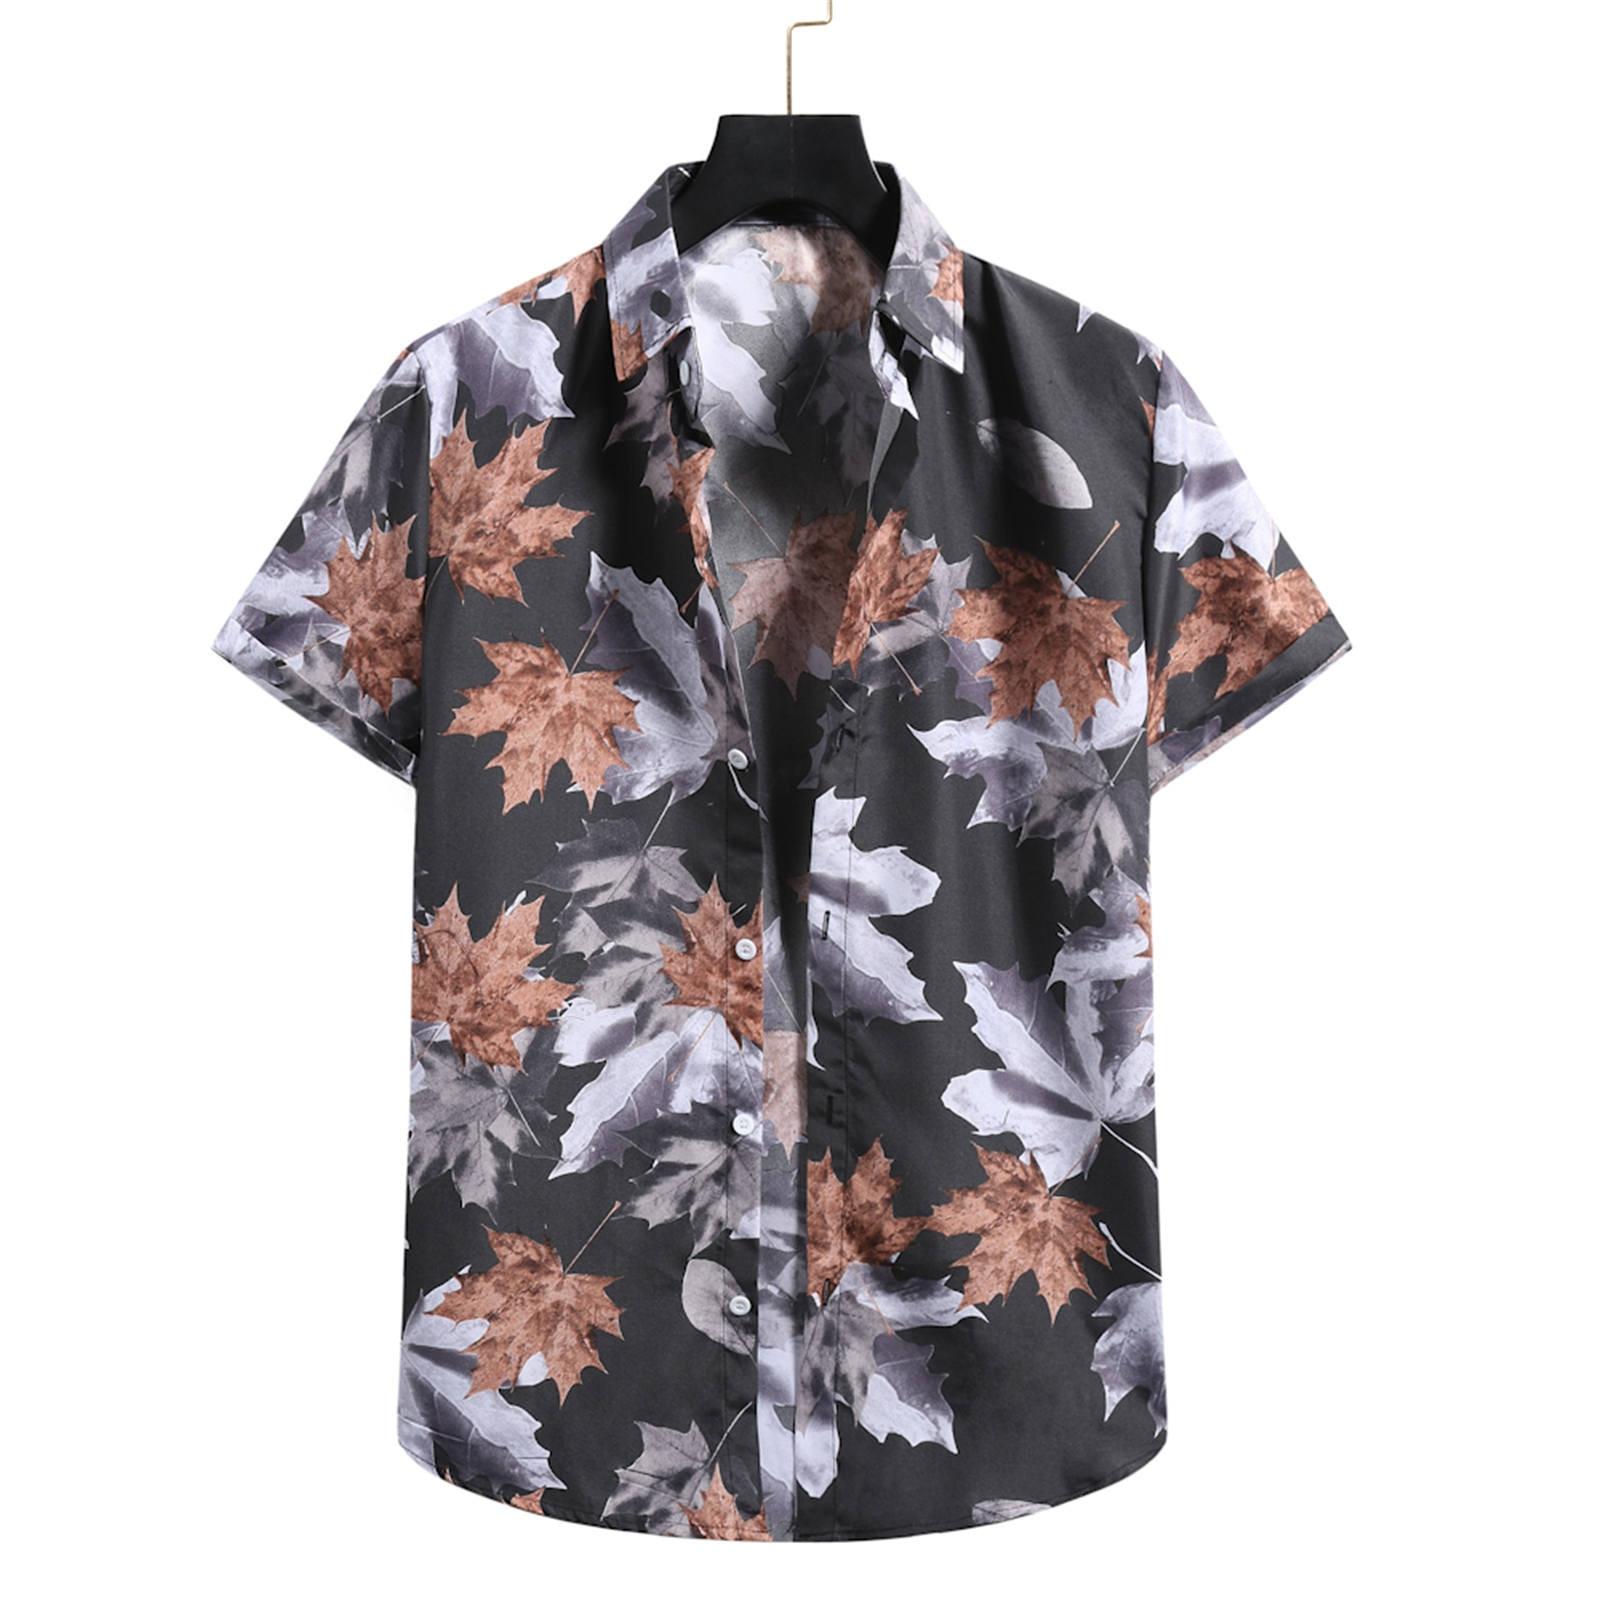 MensShort Sleeve Shirts Cardigan Hawaiian Beach Flower For Men Turtleneck Shirt Chemise Homme shirts for men